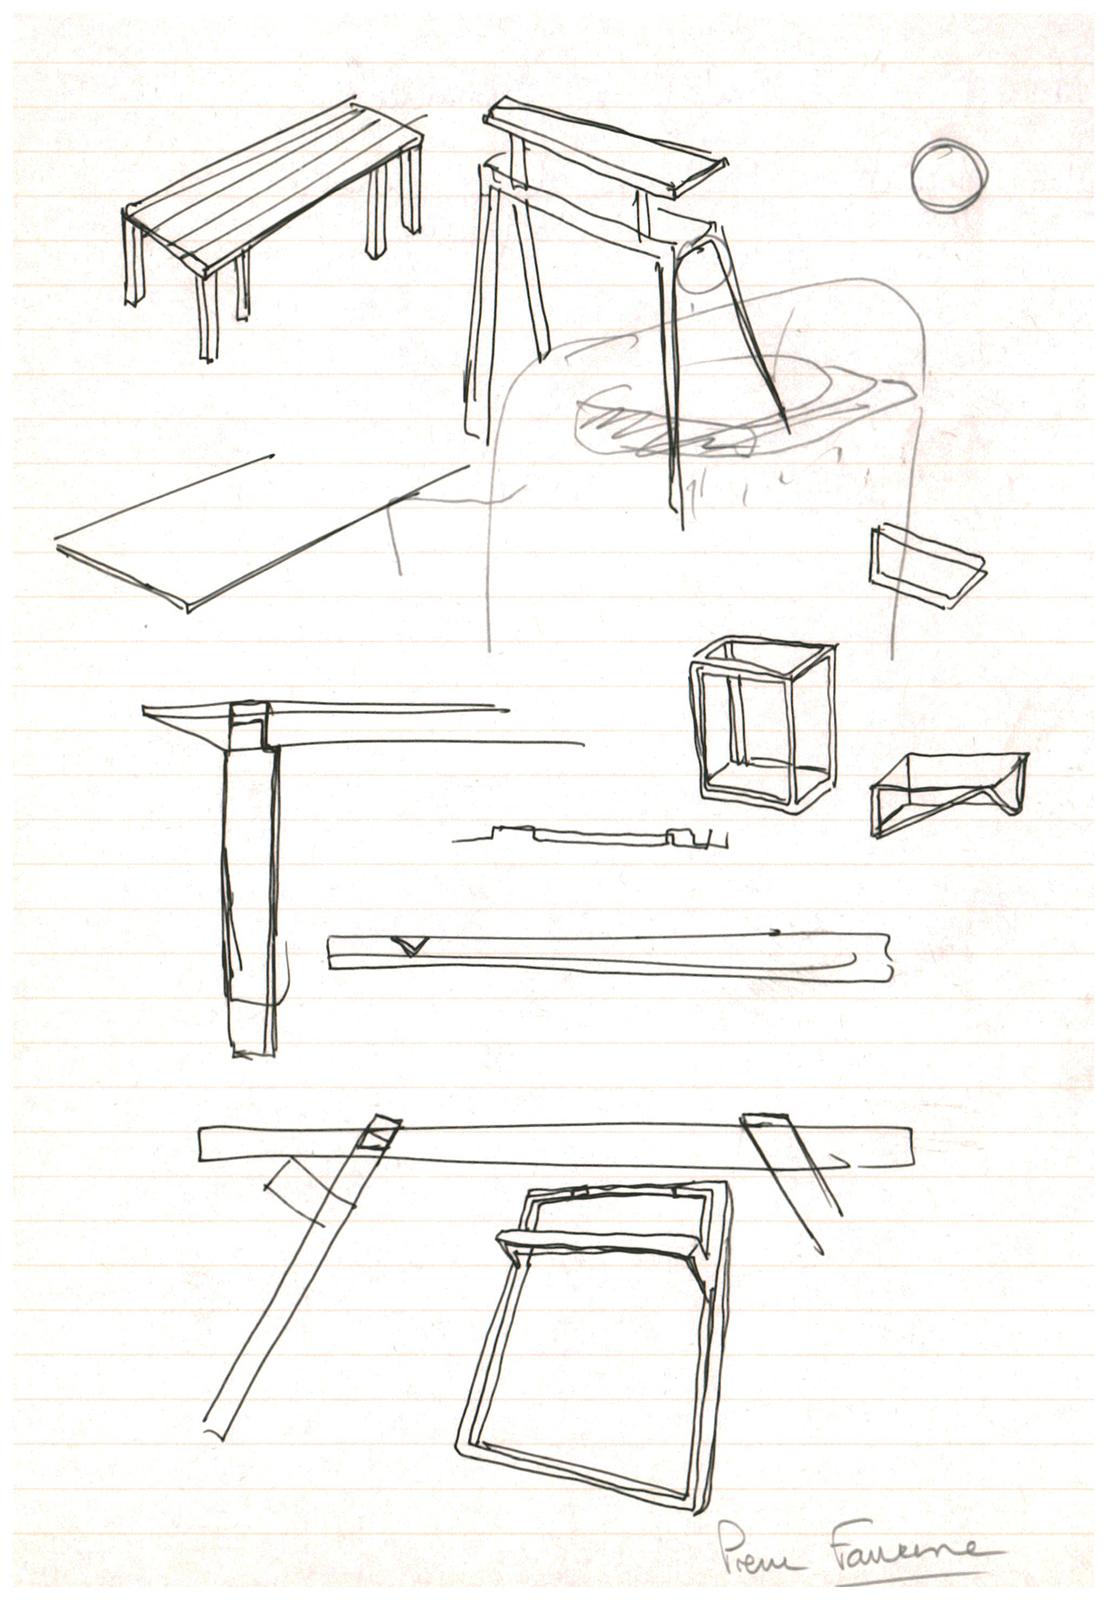 Pierre Favresse - Drawing - Work - Designer - Design - Preparatory sketch n°5